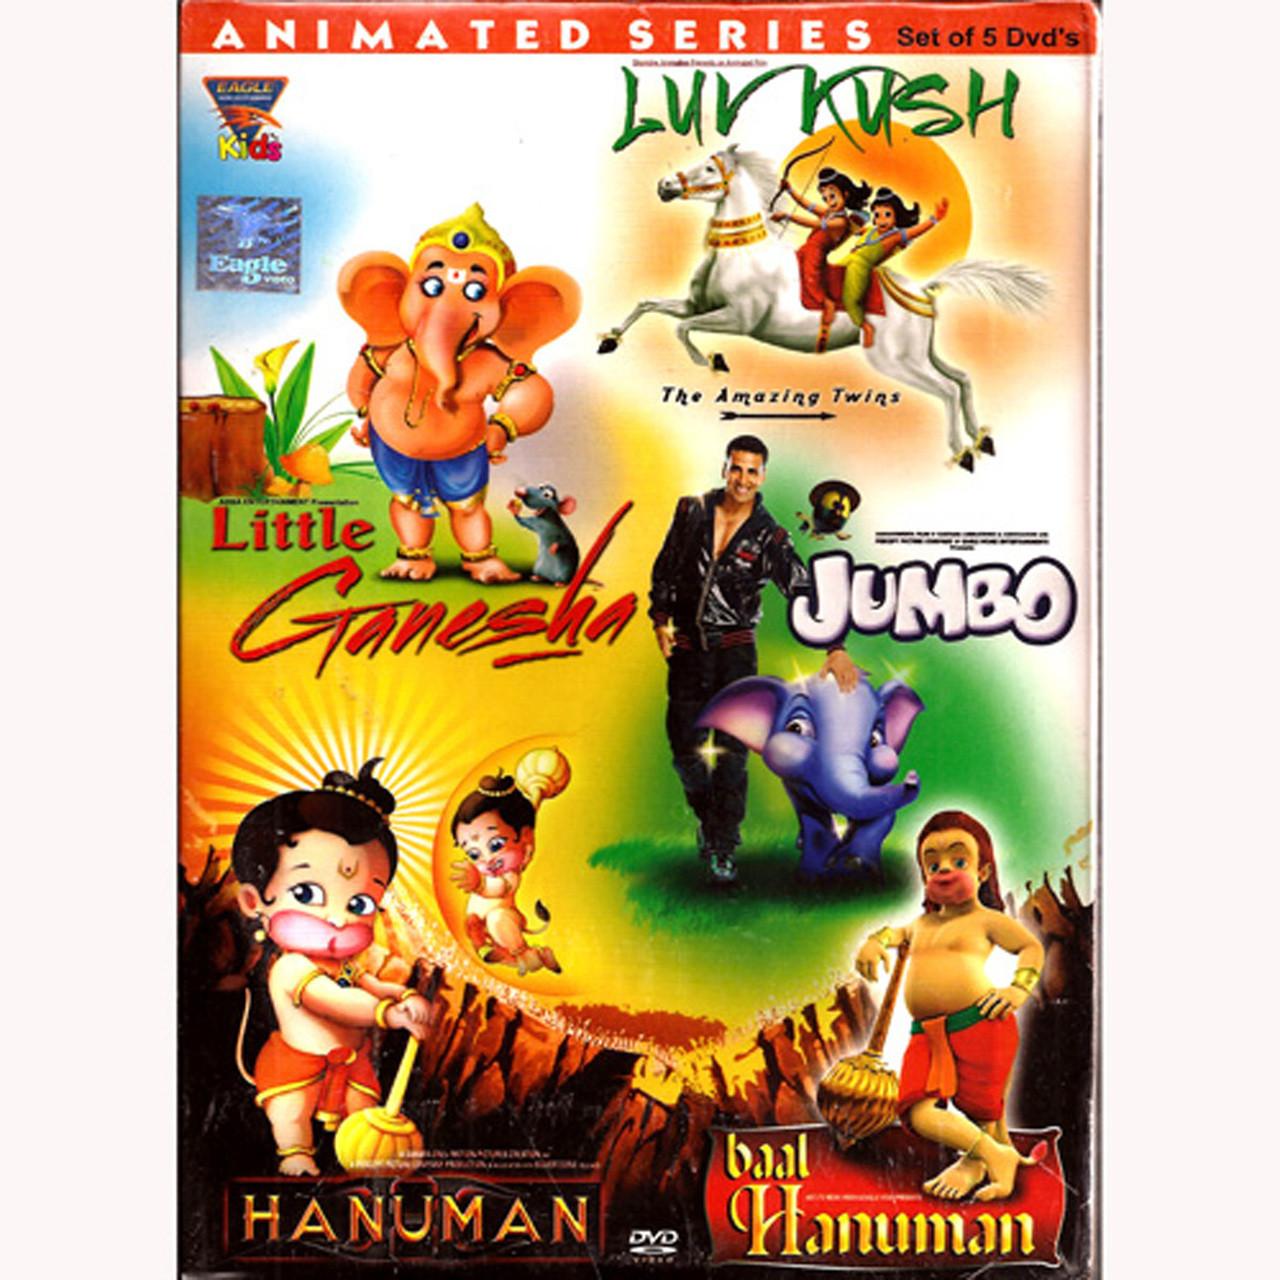 Animated Series Set Of 5 DVDS-Little Ganesha, Luv Kush, Jumbo, Hanuman,  Baal Hanuman